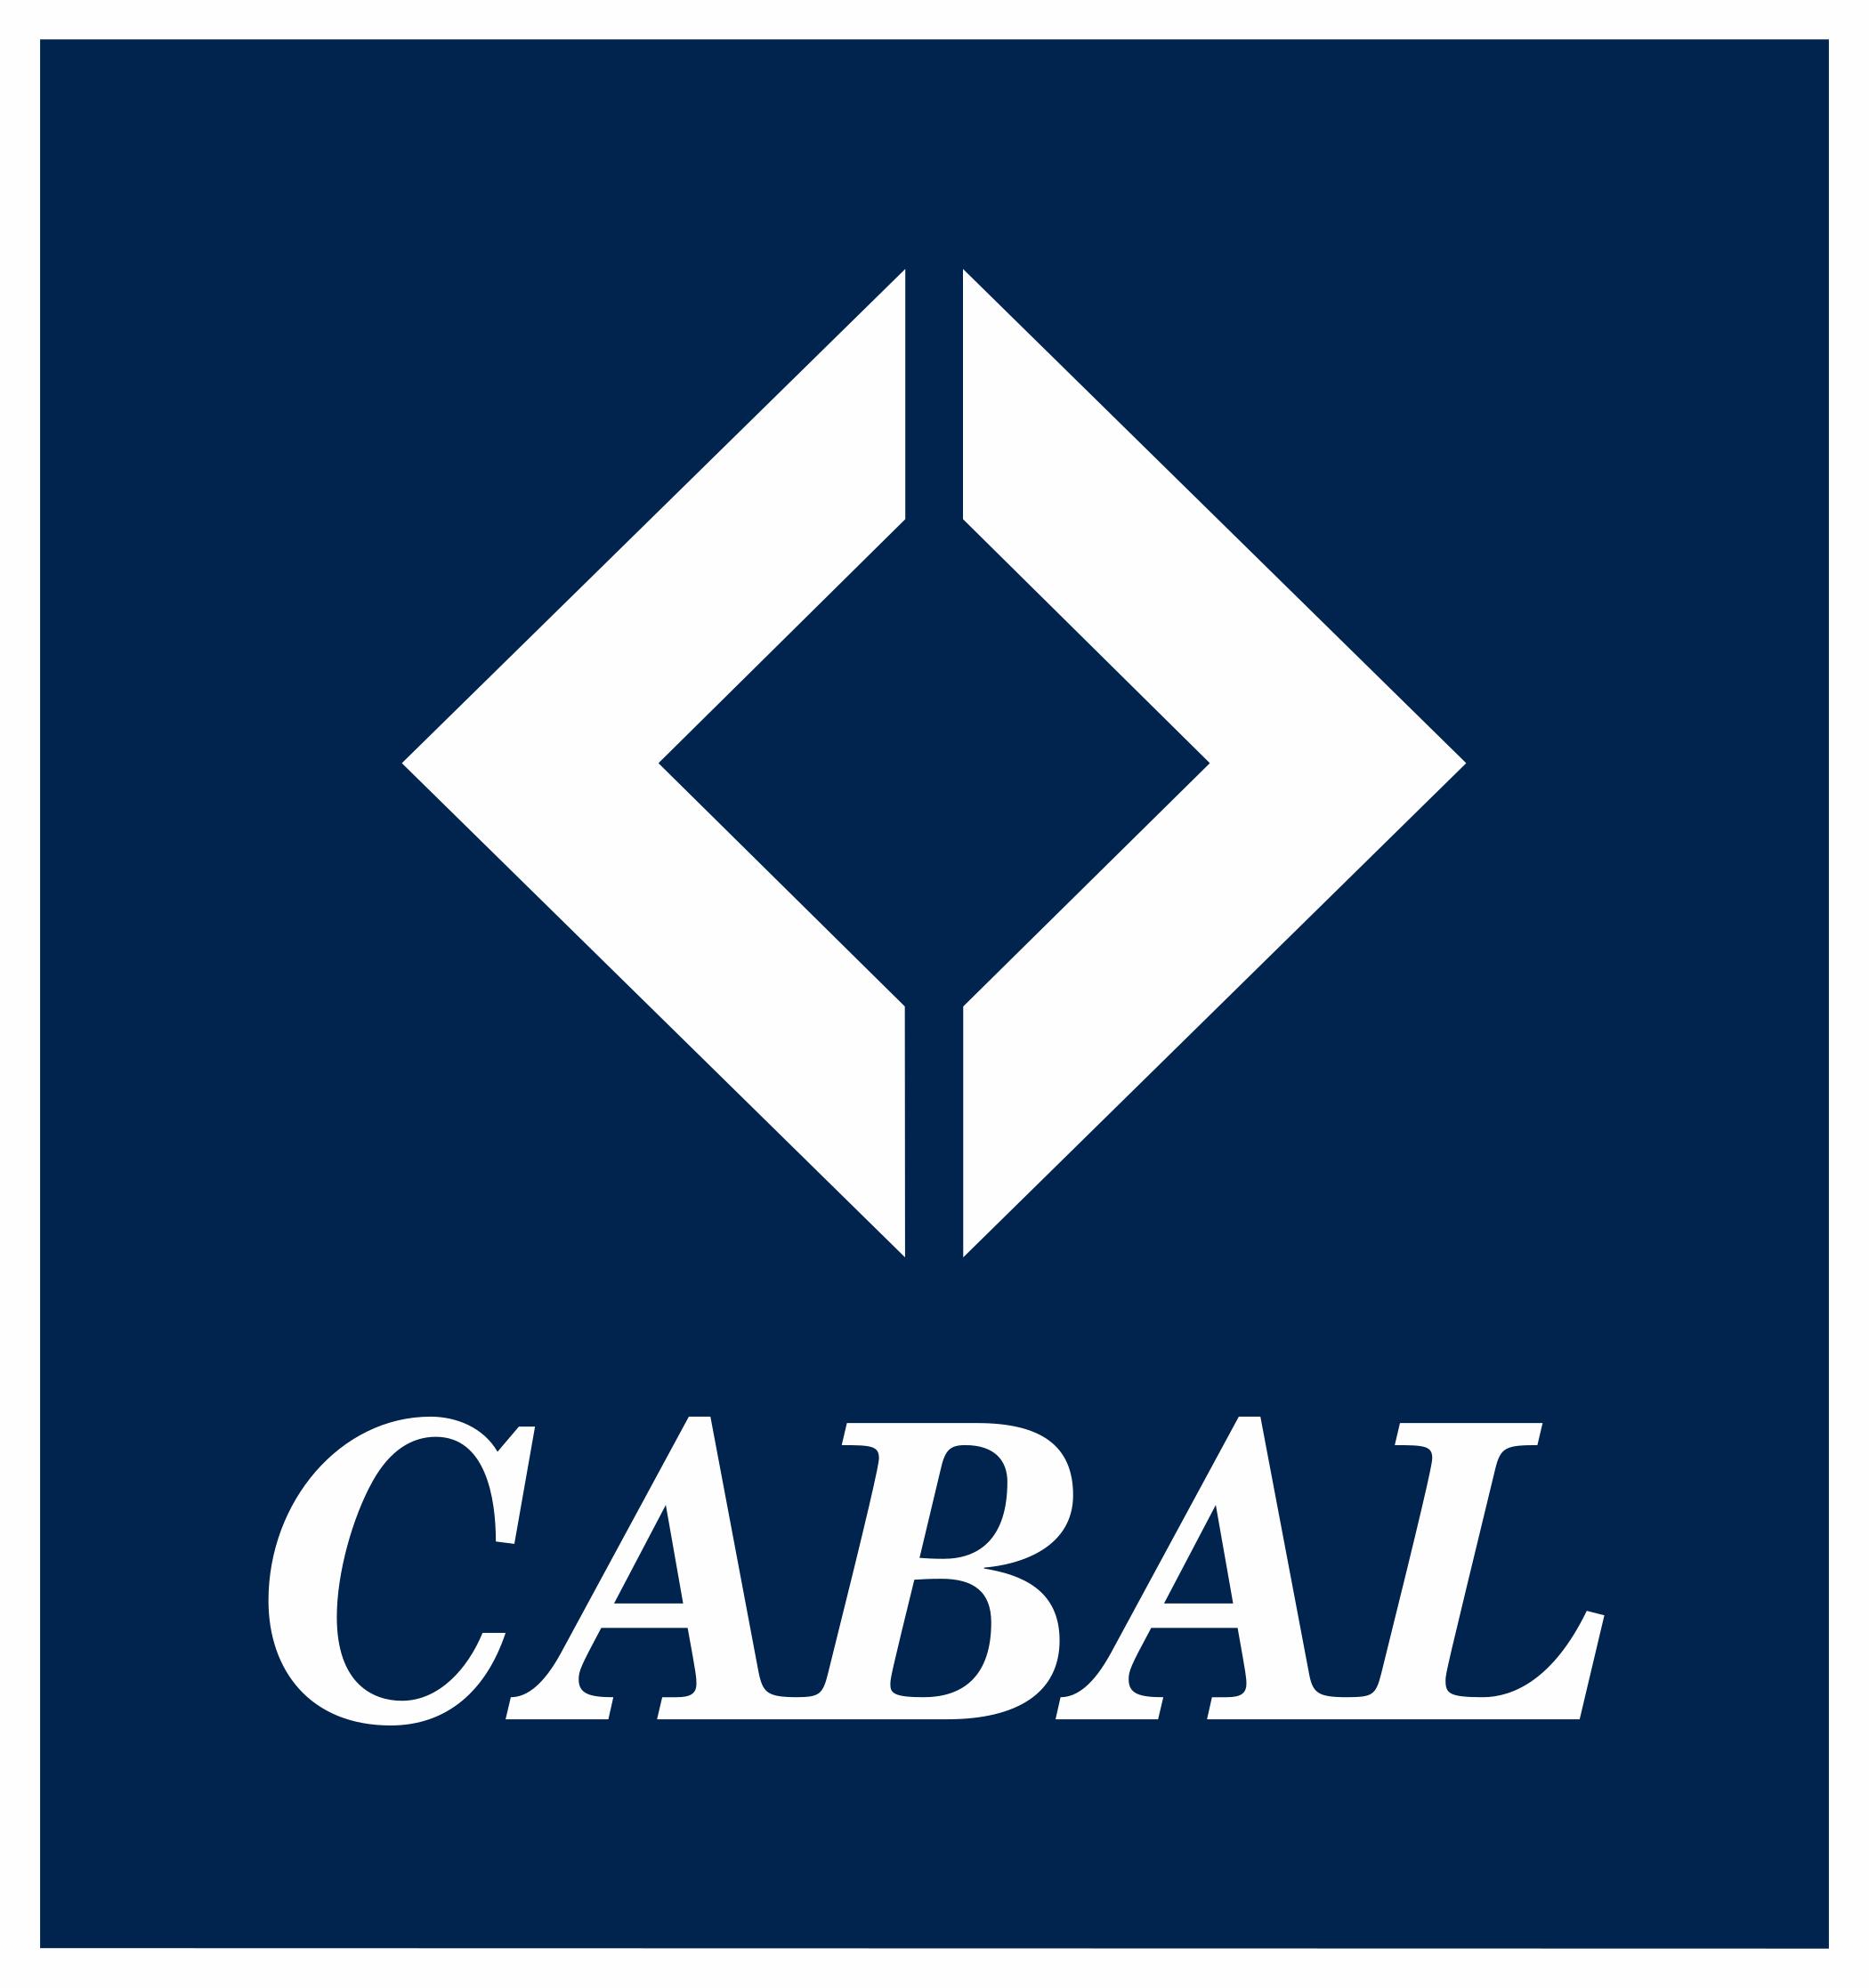 cabal logo cartao 1 - Cabal Logo - Cartão Cabal Logo